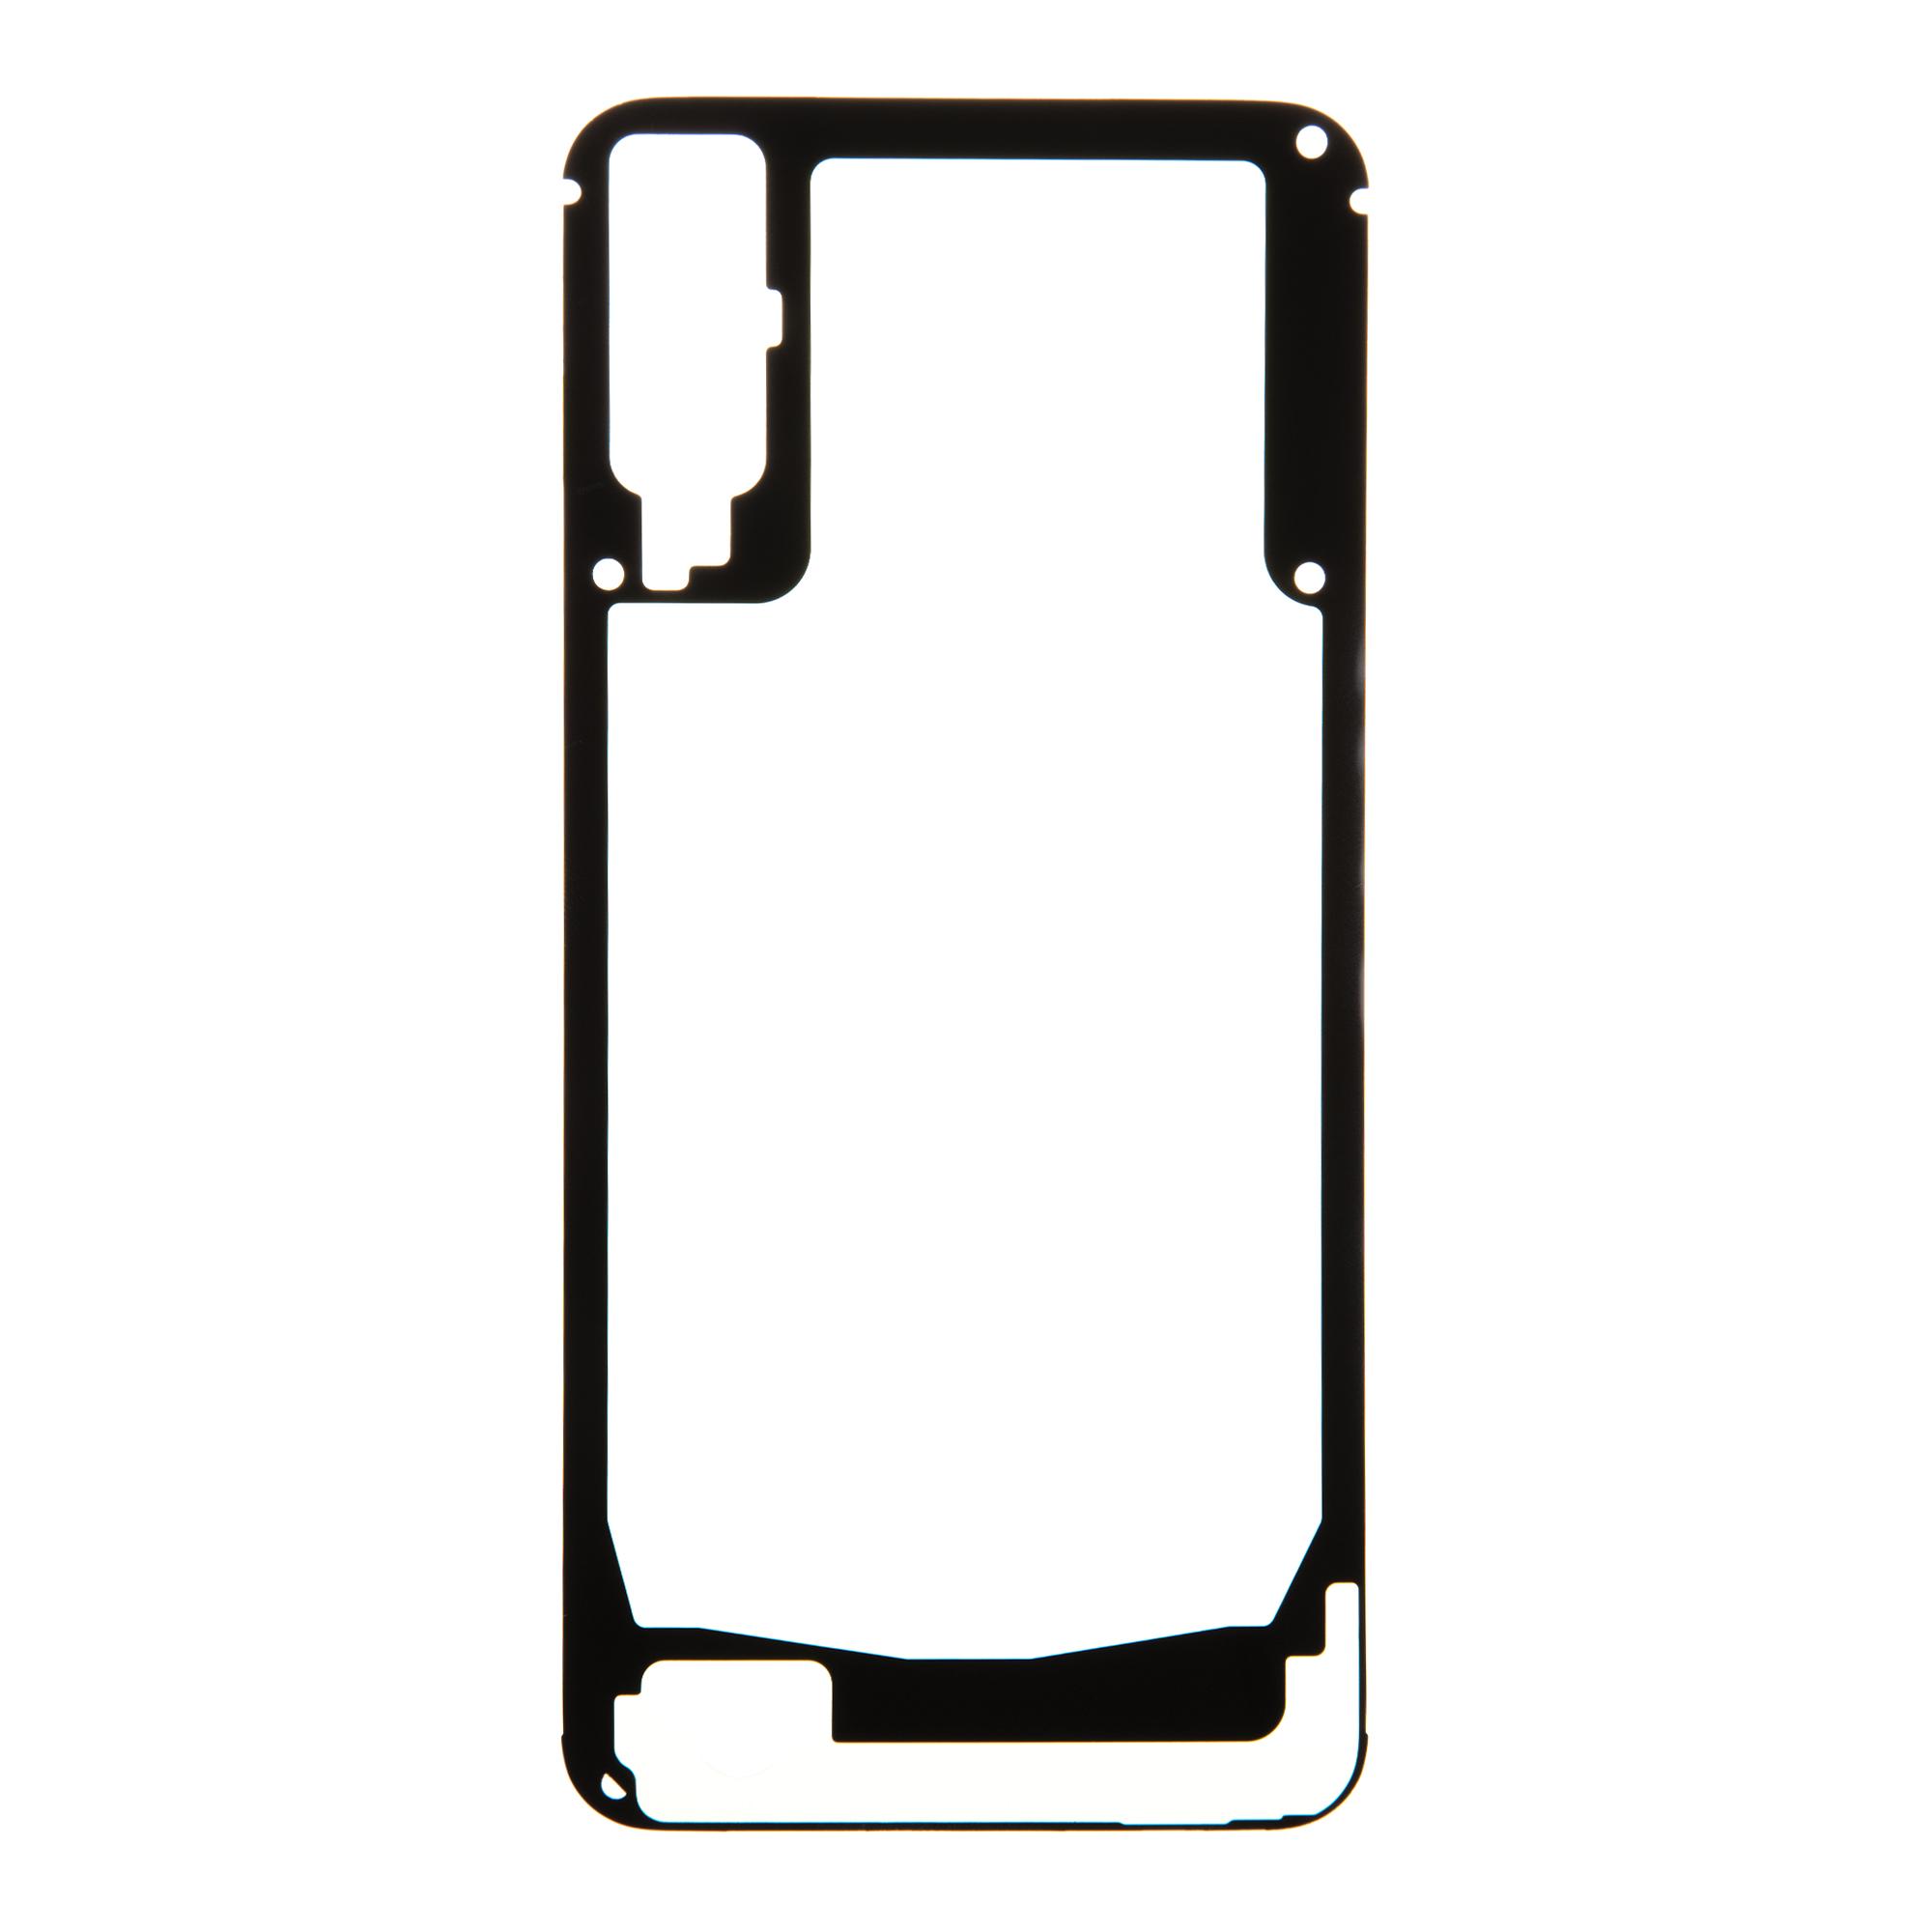 Samsung A505F Galaxy A50 Lepicí Páska pod Kryt Baterie (Service Pack)